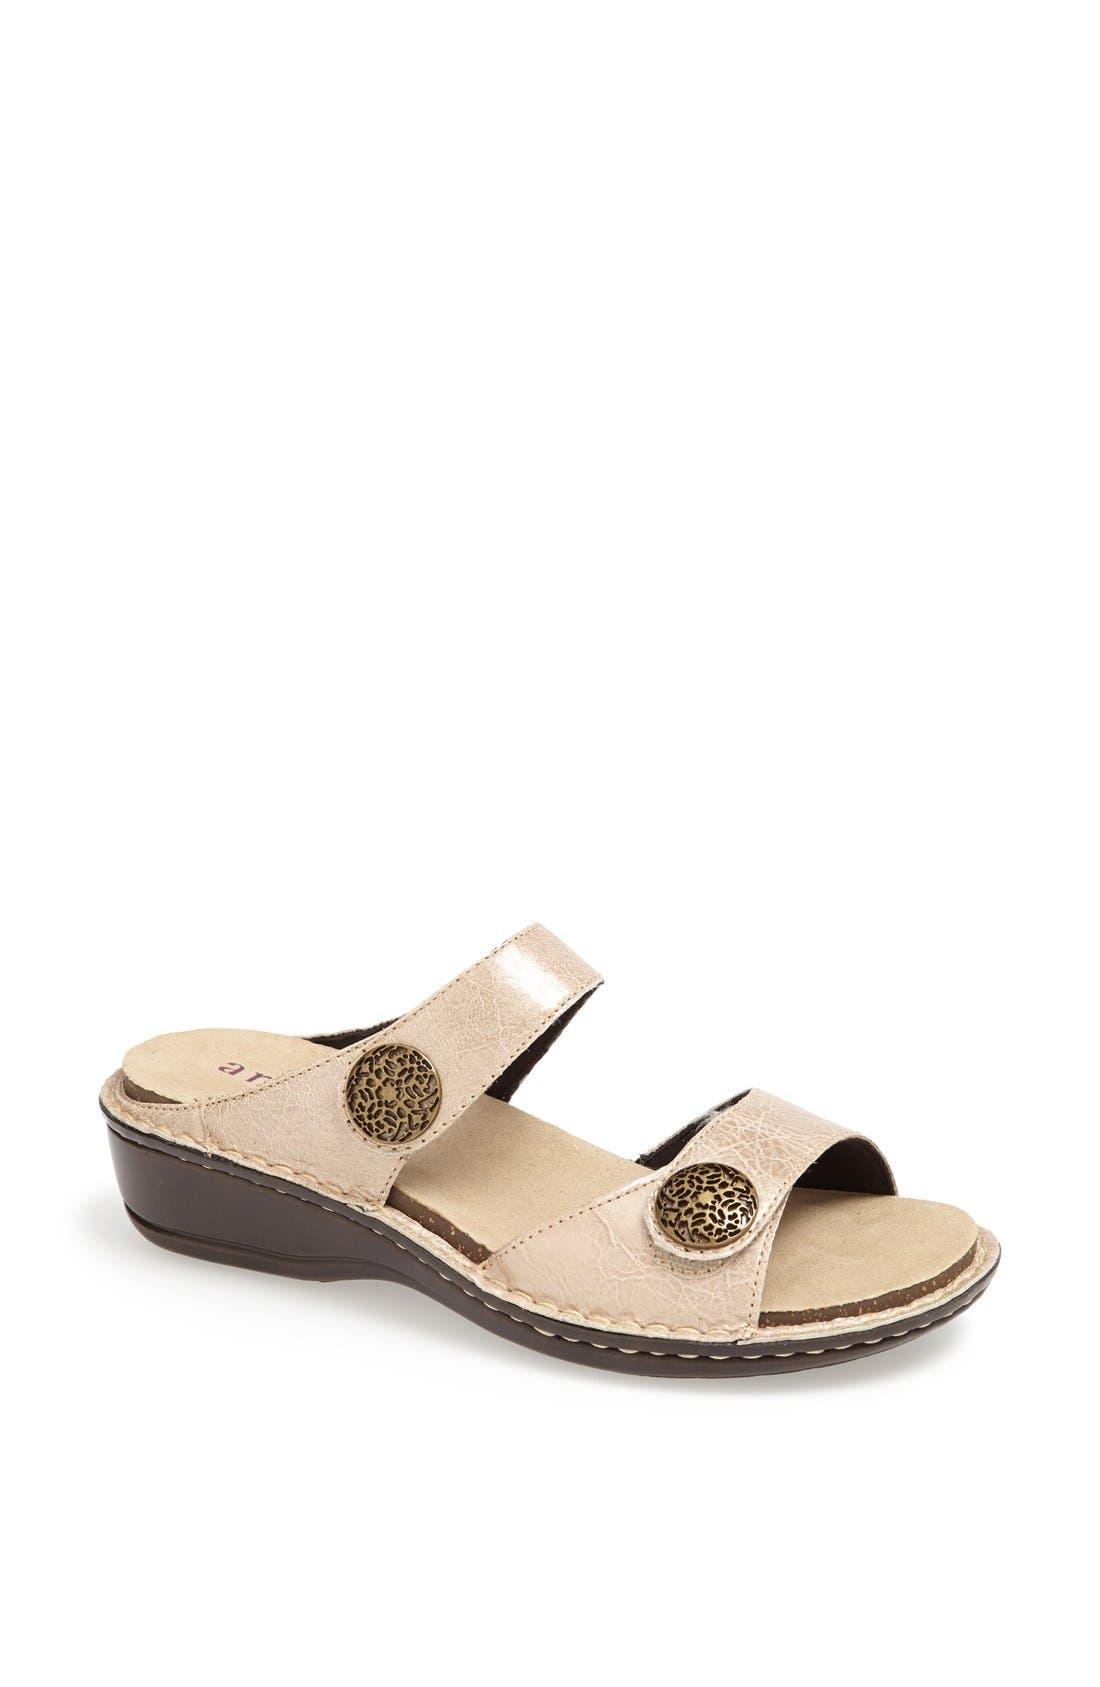 Alternate Image 1 Selected - Aravon Sandal